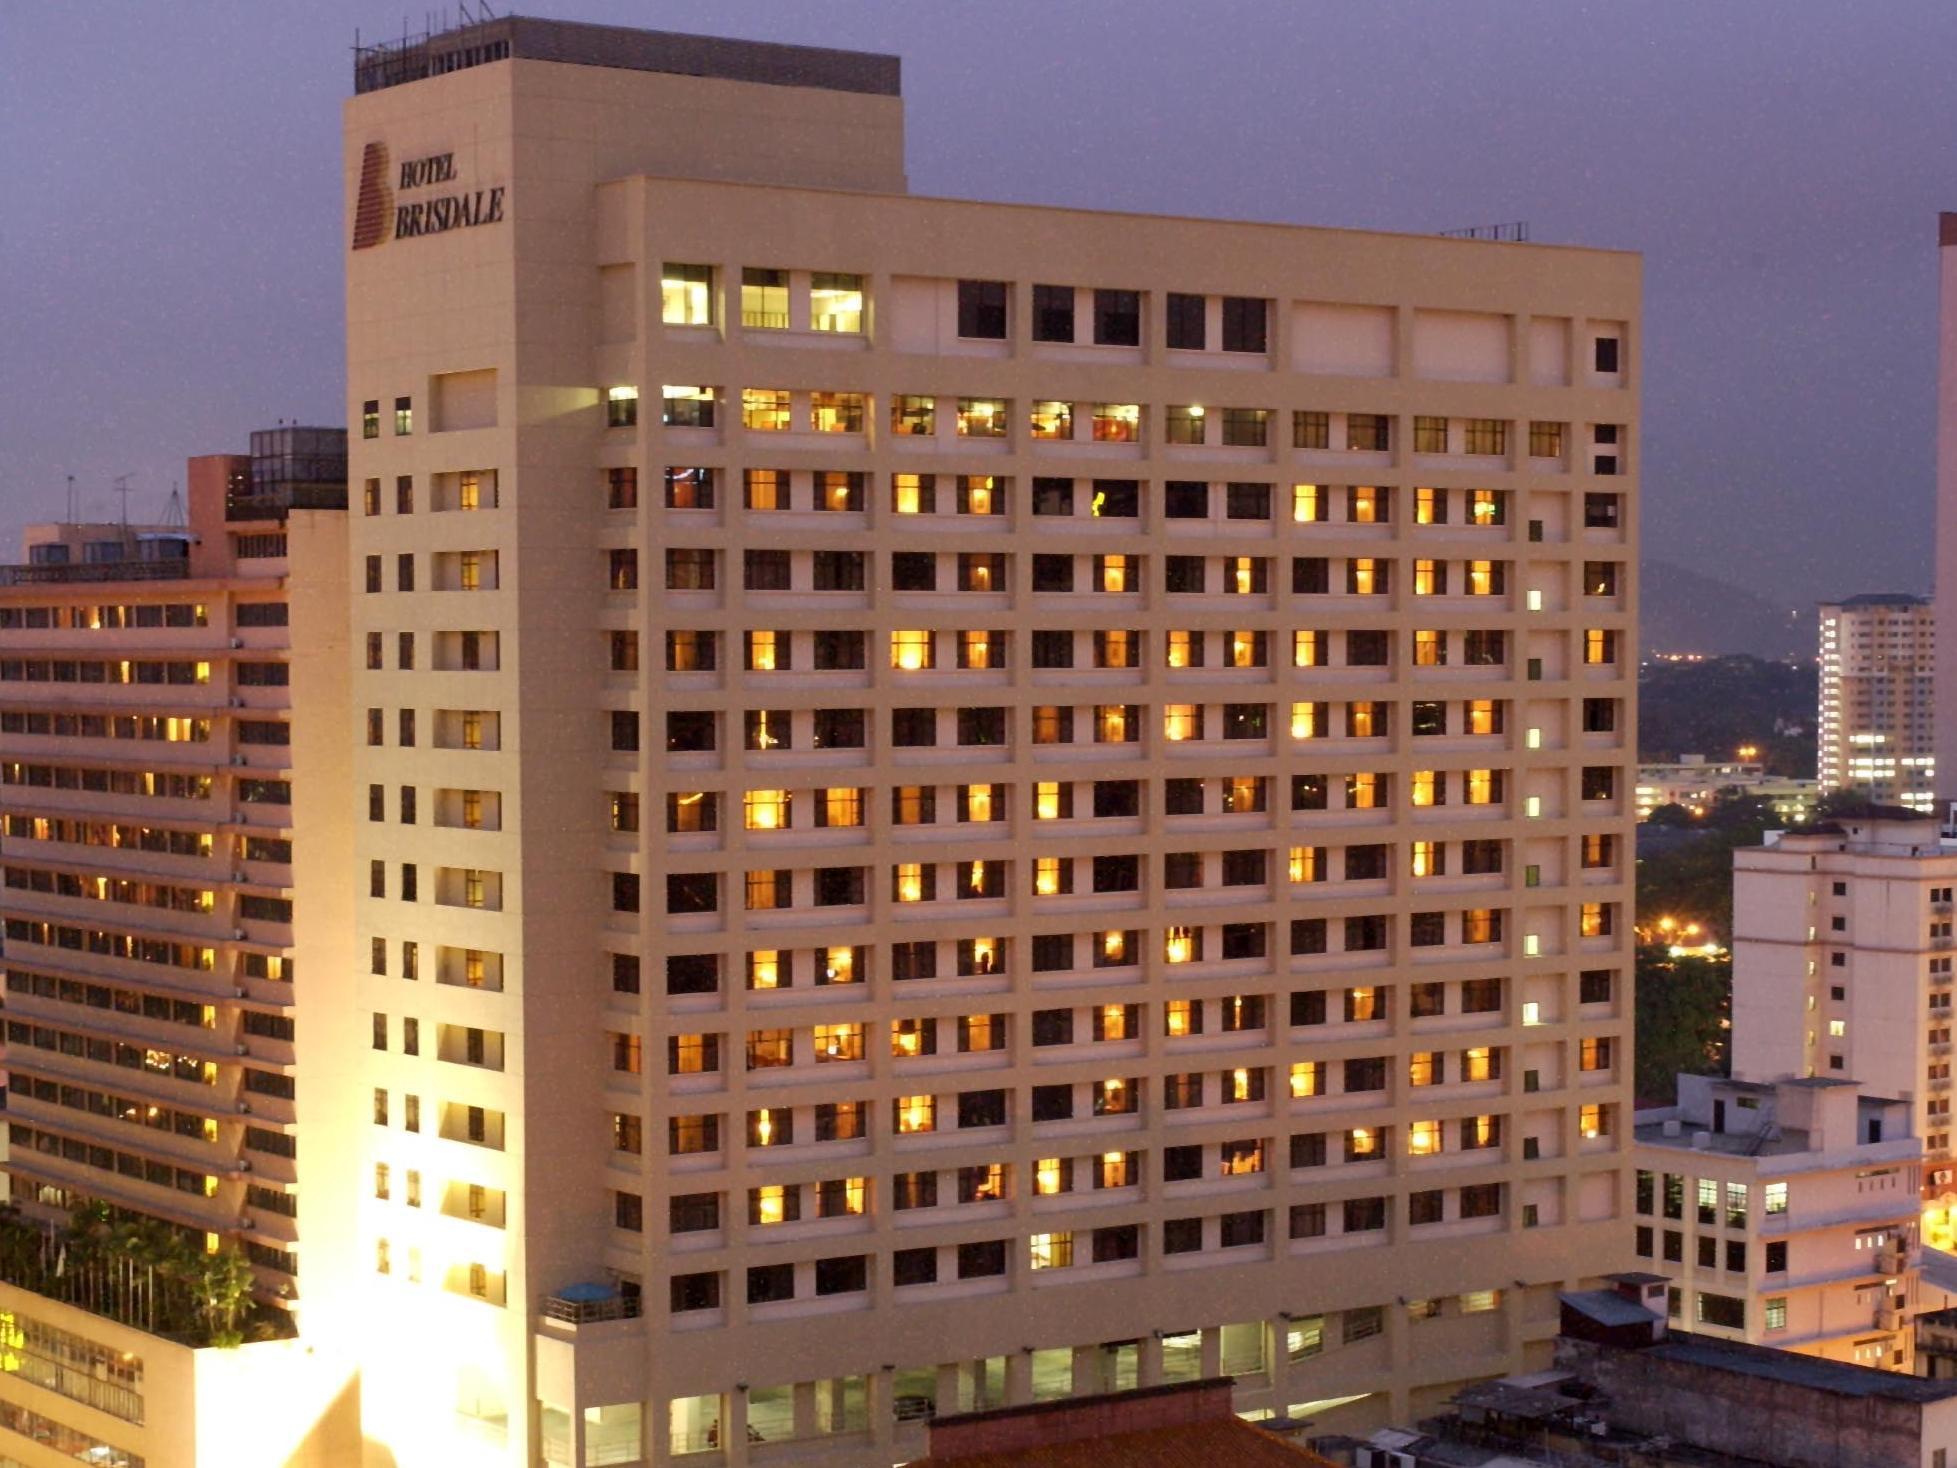 Brisdale Hotel